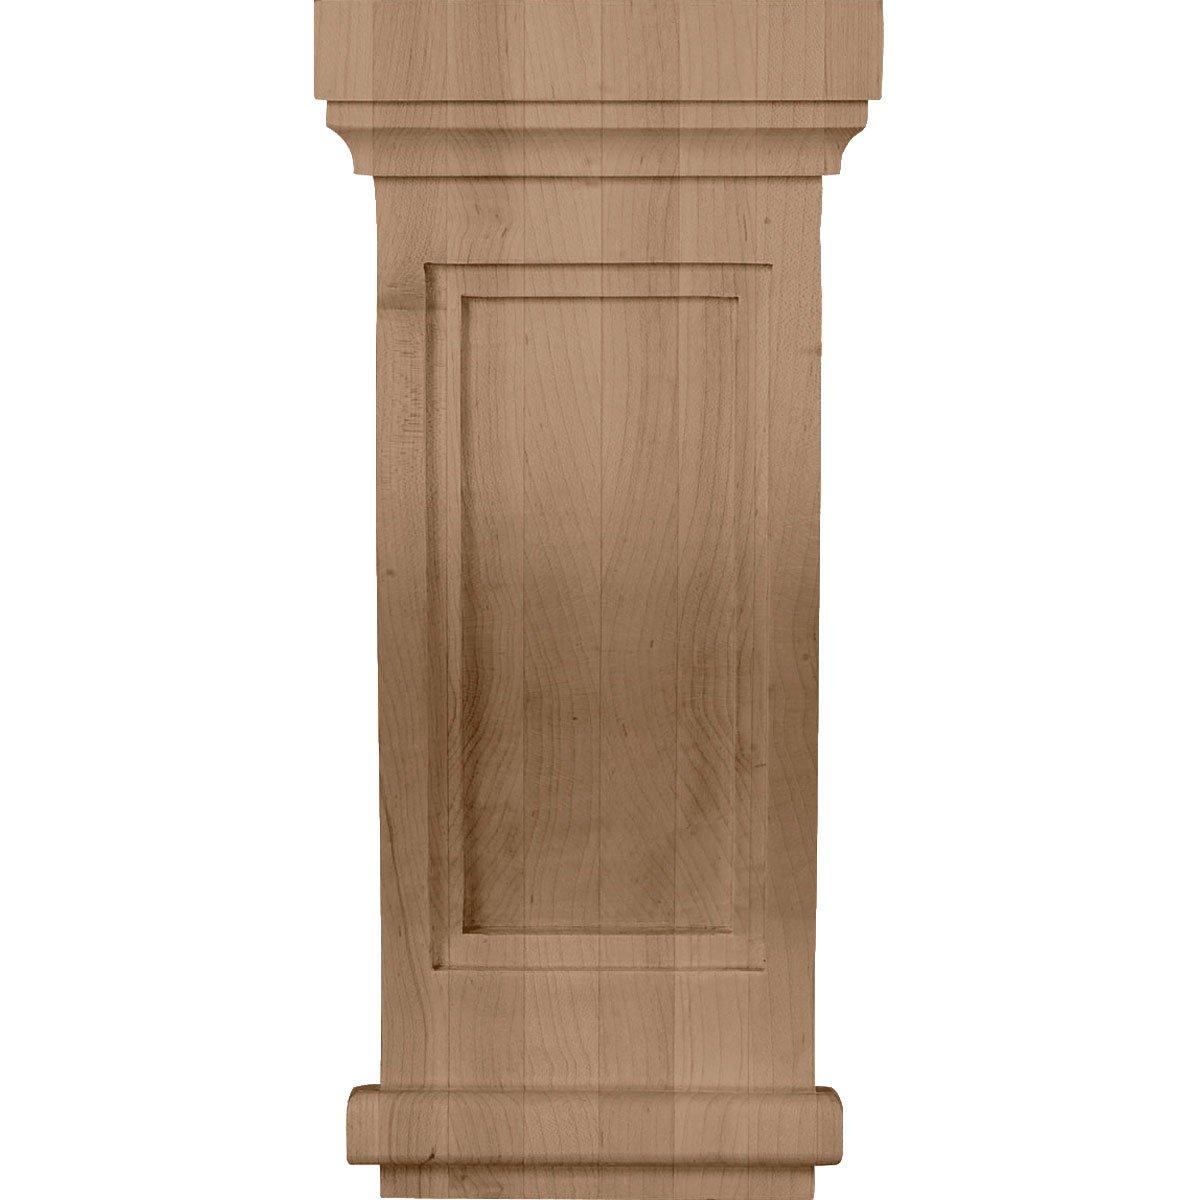 Ekena Millwork COR06X06X14TRMA 6 1//2-Inch W x 6 1//2-Inch D x 14-Inch H Charleston Mission Corbel Maple